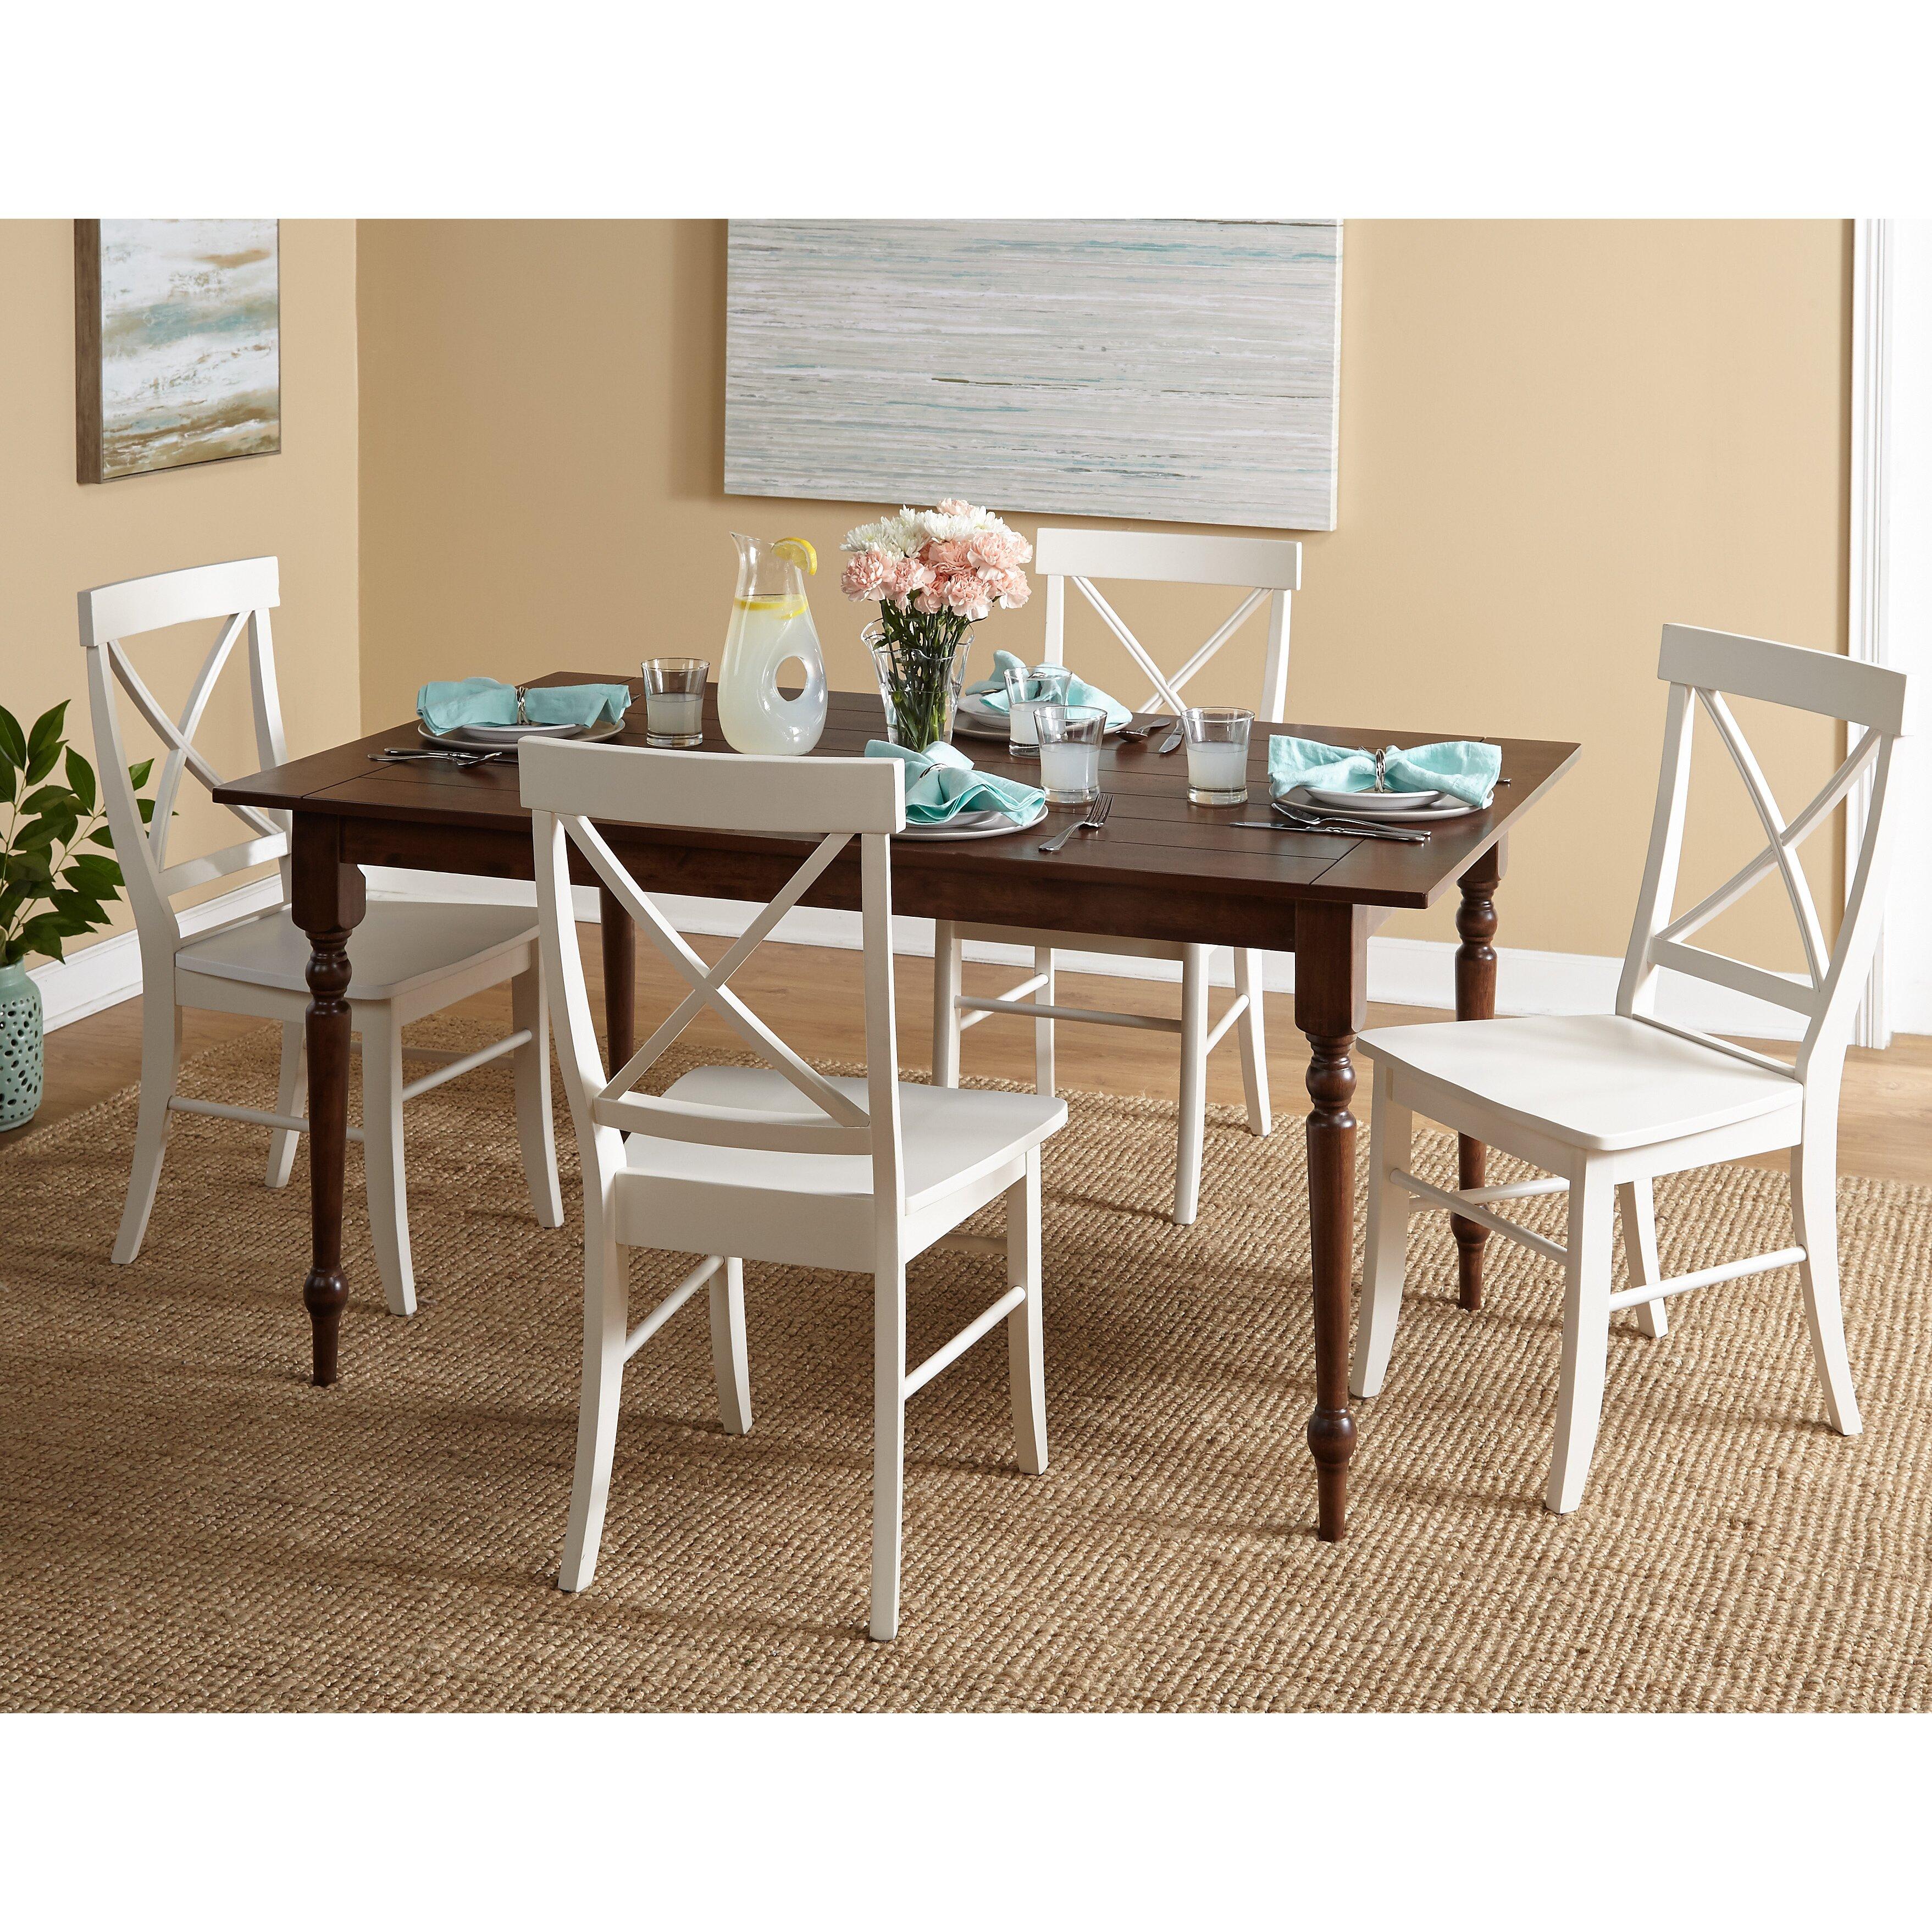 5 Piece Dining Room Sets Amazon Com: August Grove Deville 5 Piece Dining Set